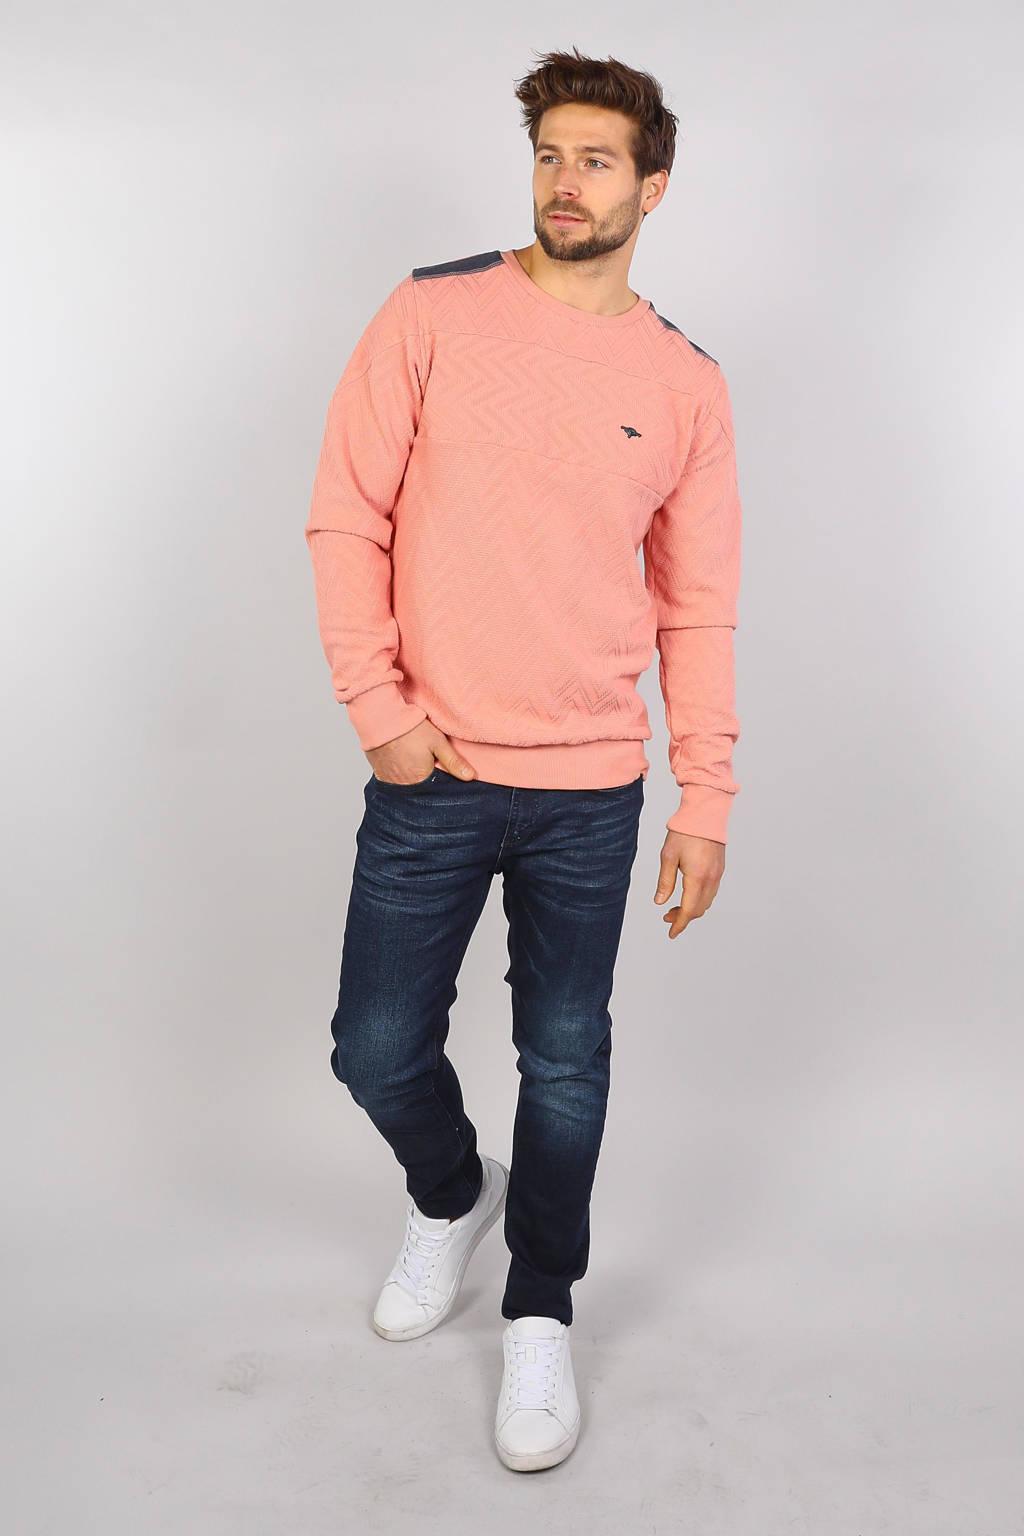 GABBIANO sweater met textuur zalmroze, Zalmroze